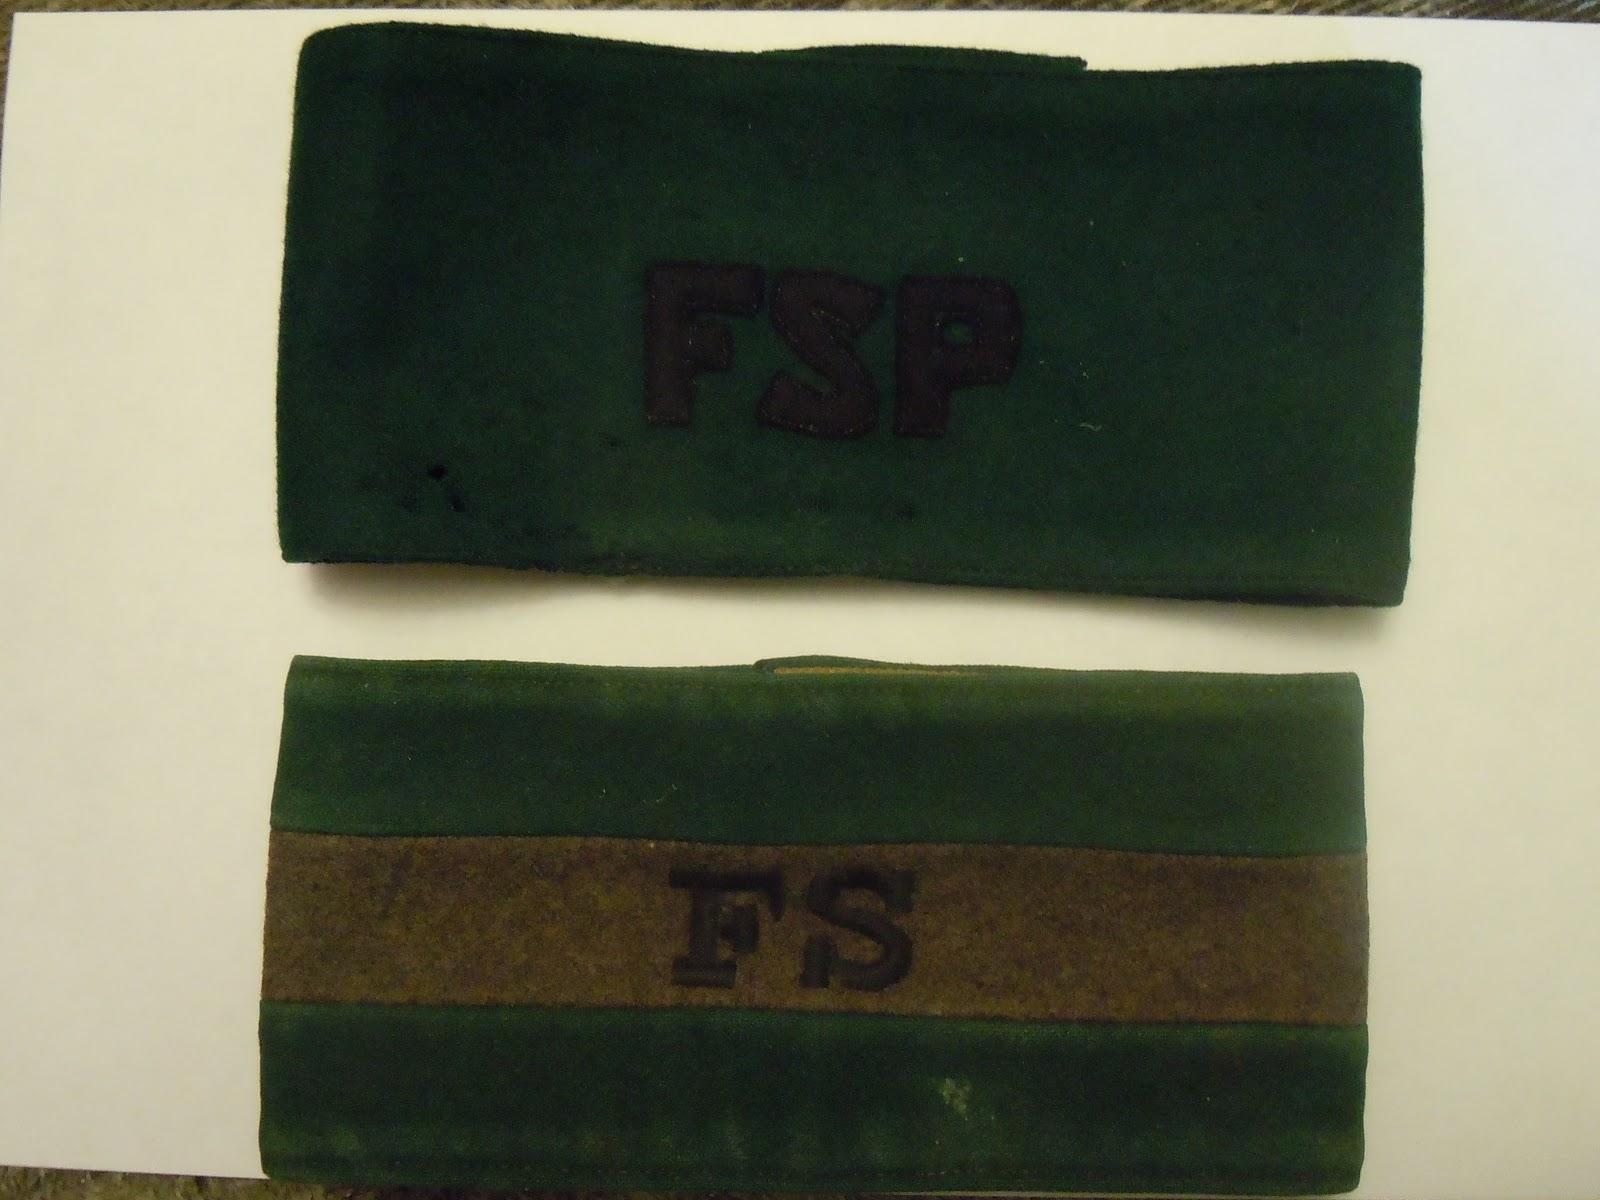 fsp armband 001.JPG